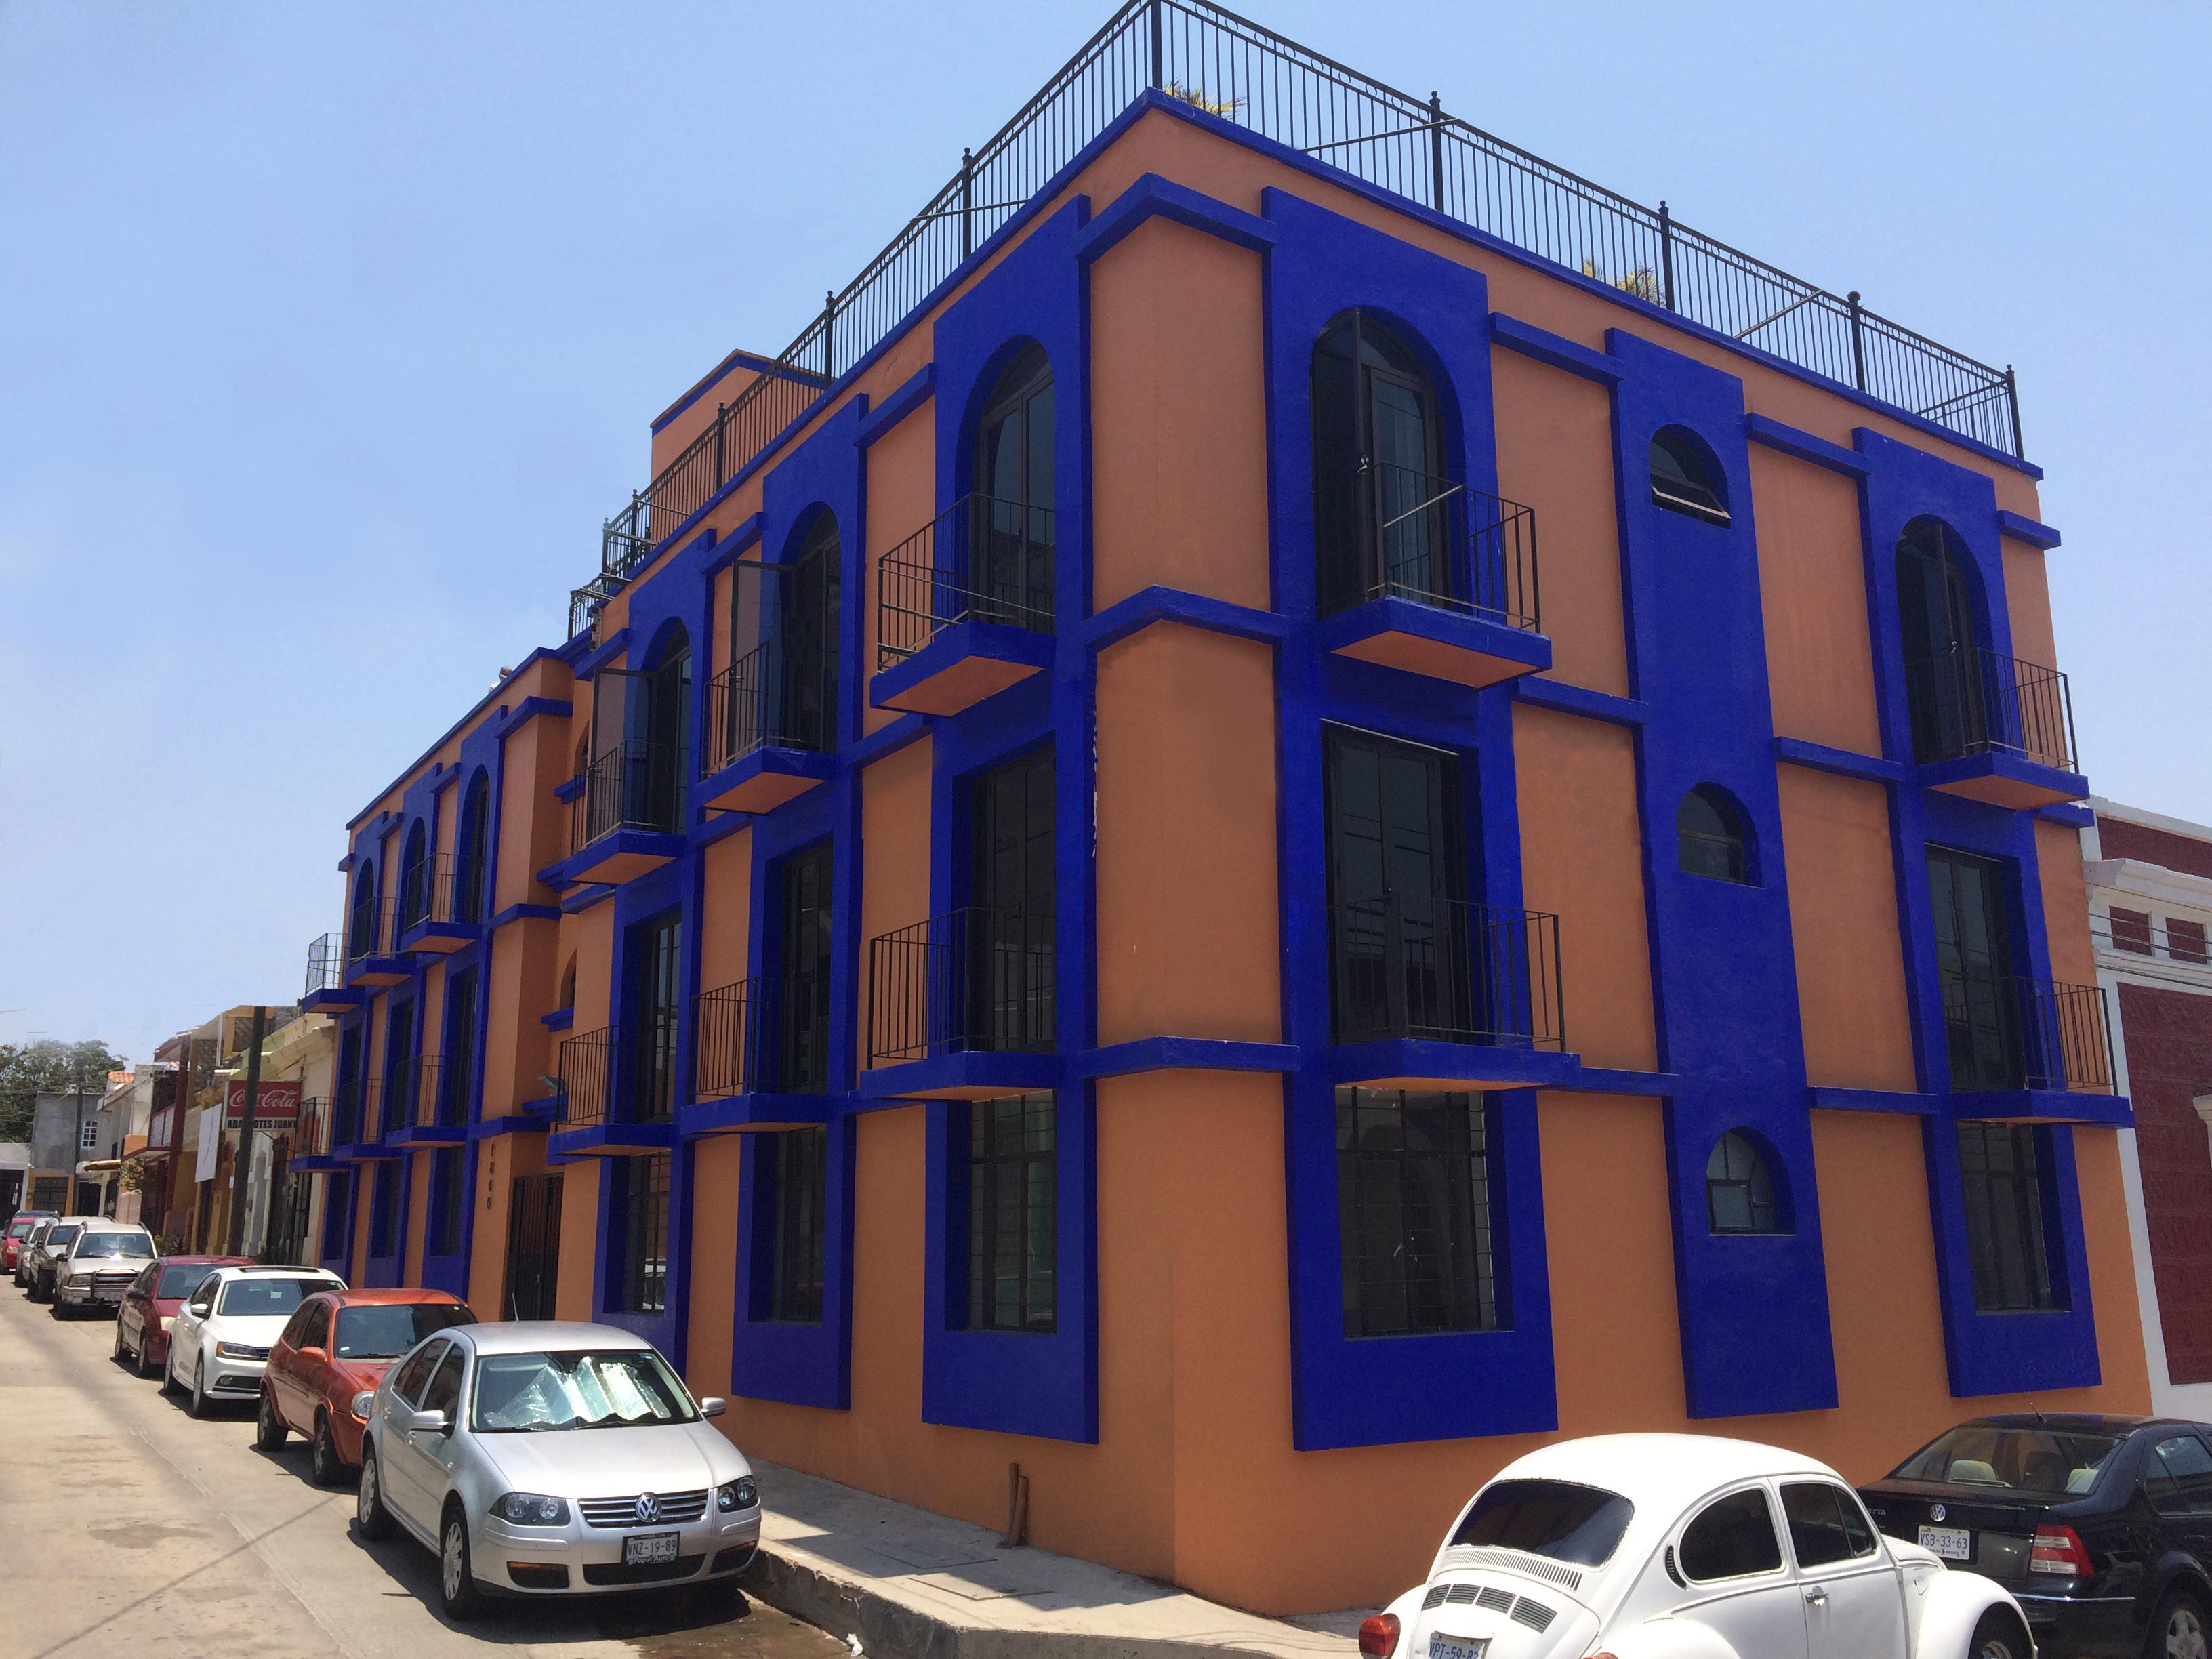 Vive e invierte en Centro Histórico de Mazatlán – NUEVO PRECIO!